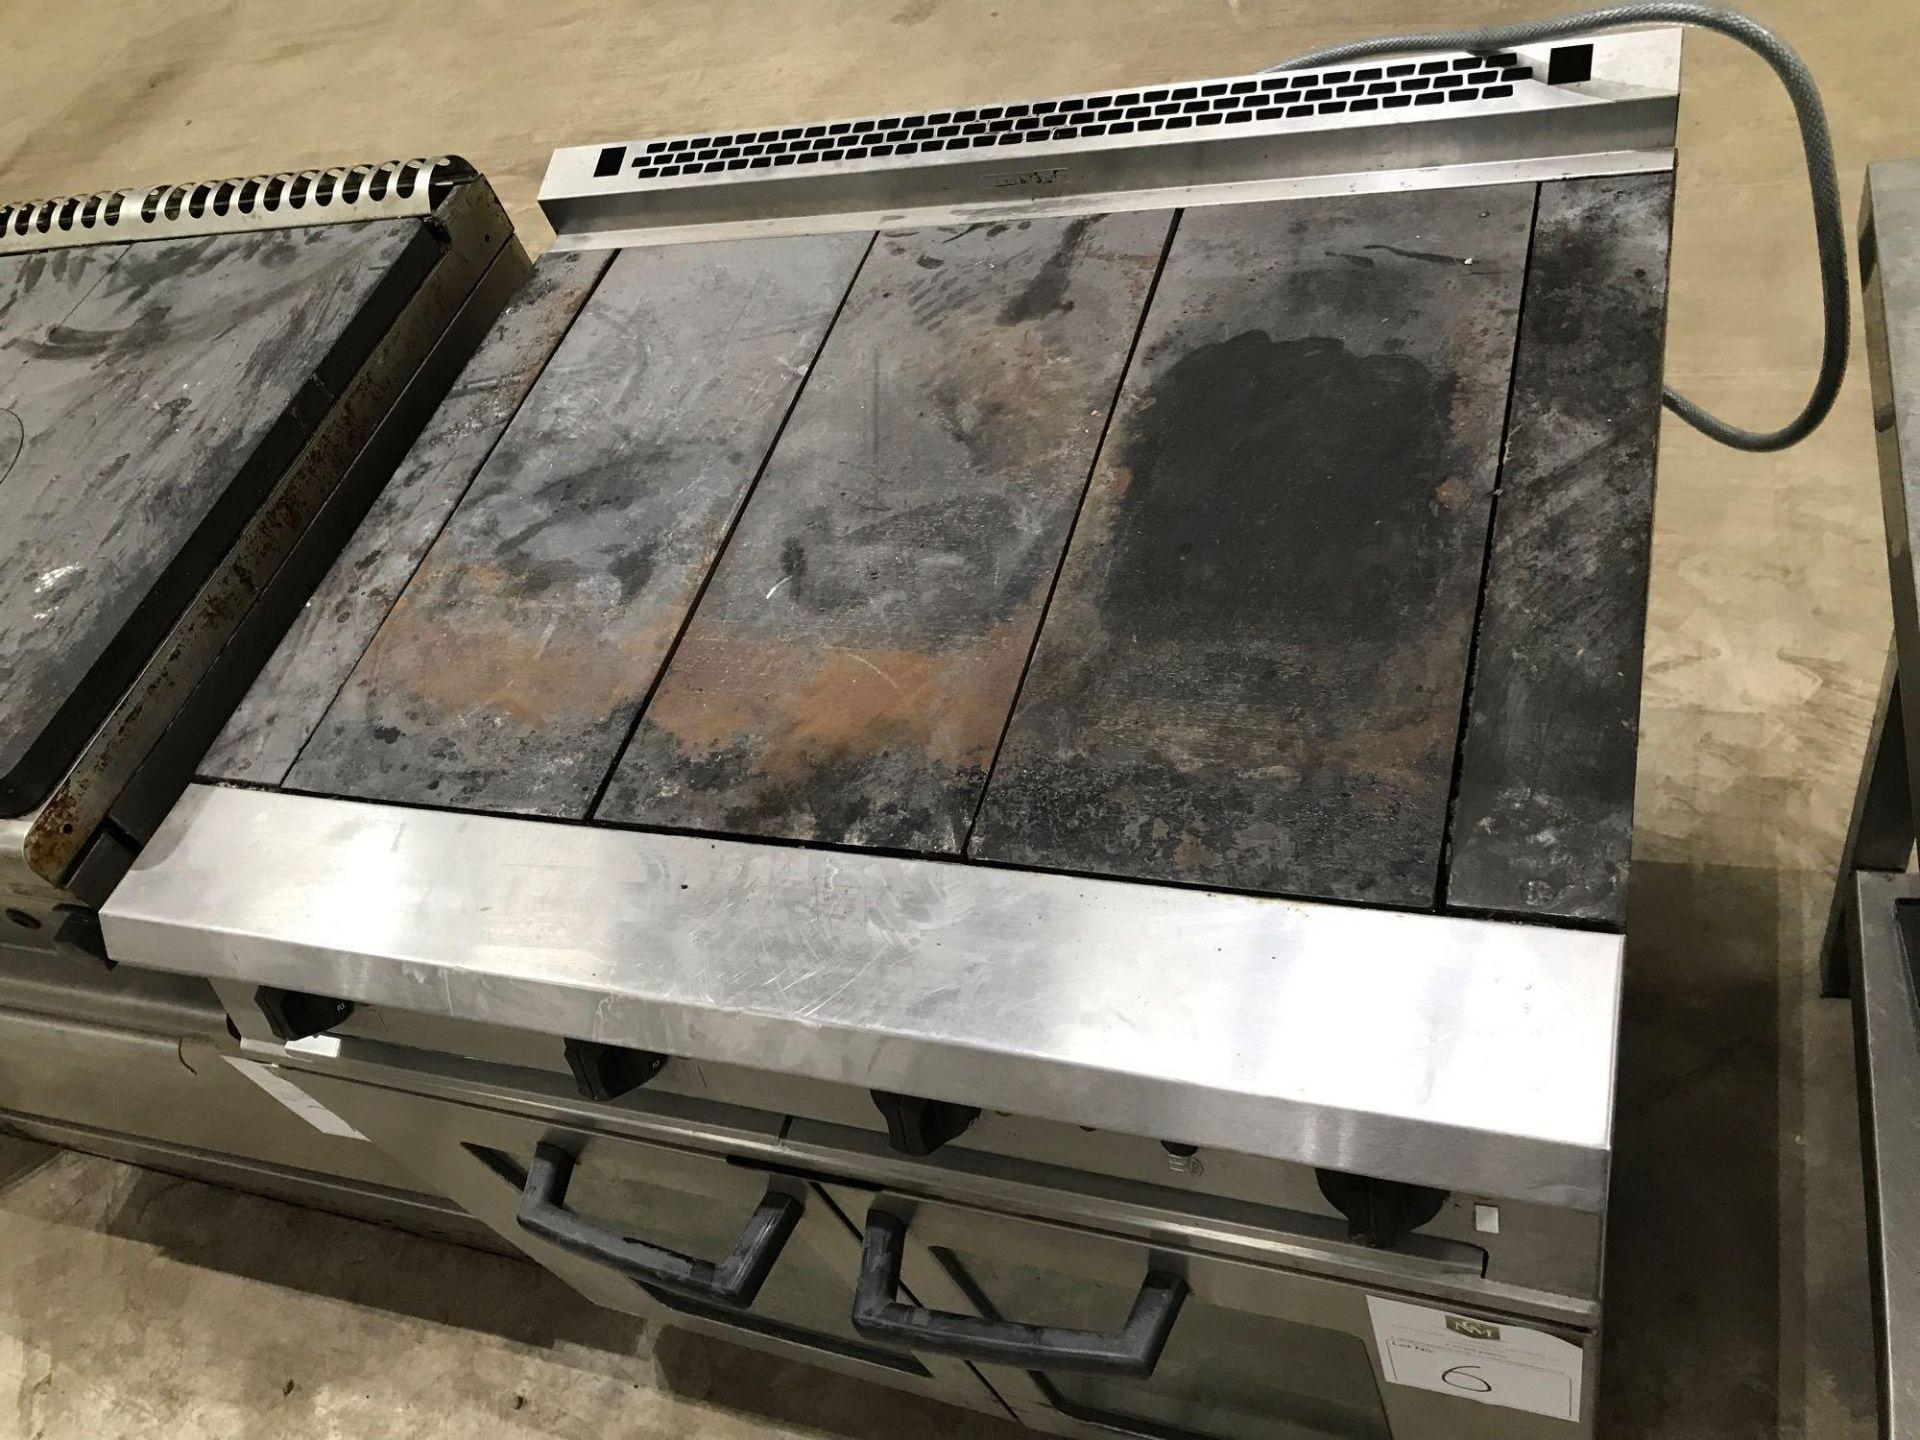 Lot 176 - Commander oven